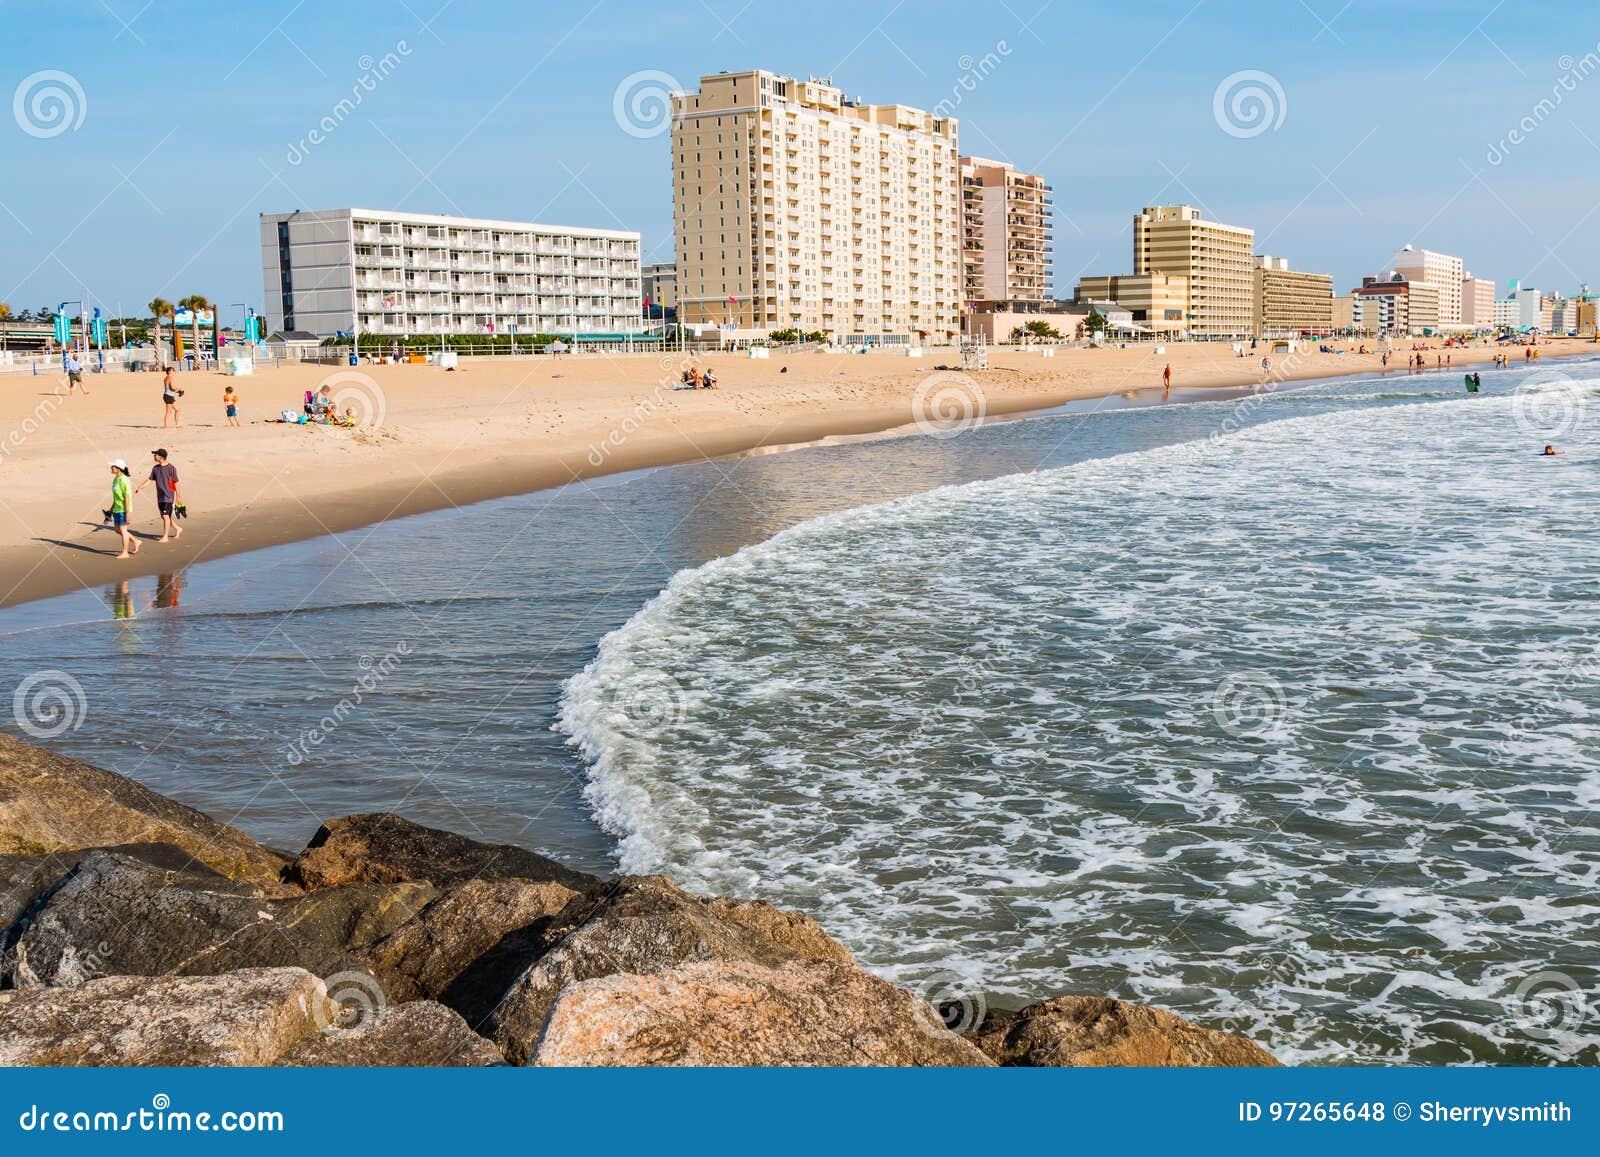 View of Virginia Beach Boardwalk Hotels and Beach